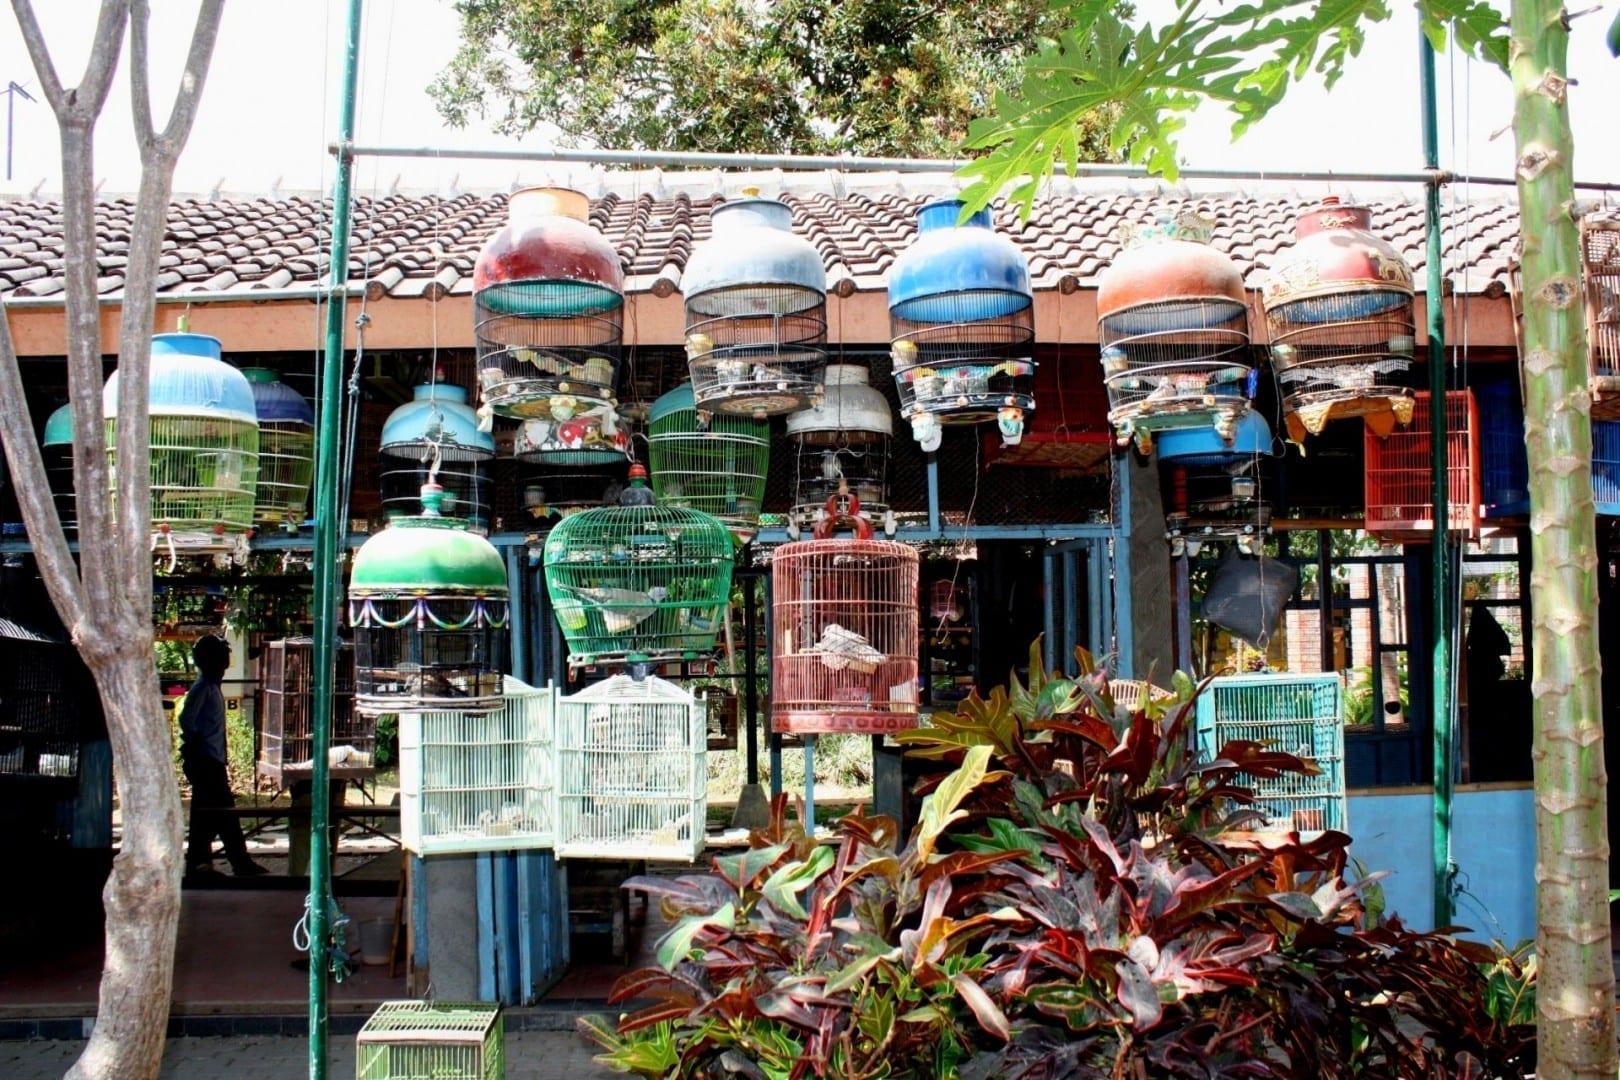 El mercado de aves Yogyakarta Indonesia